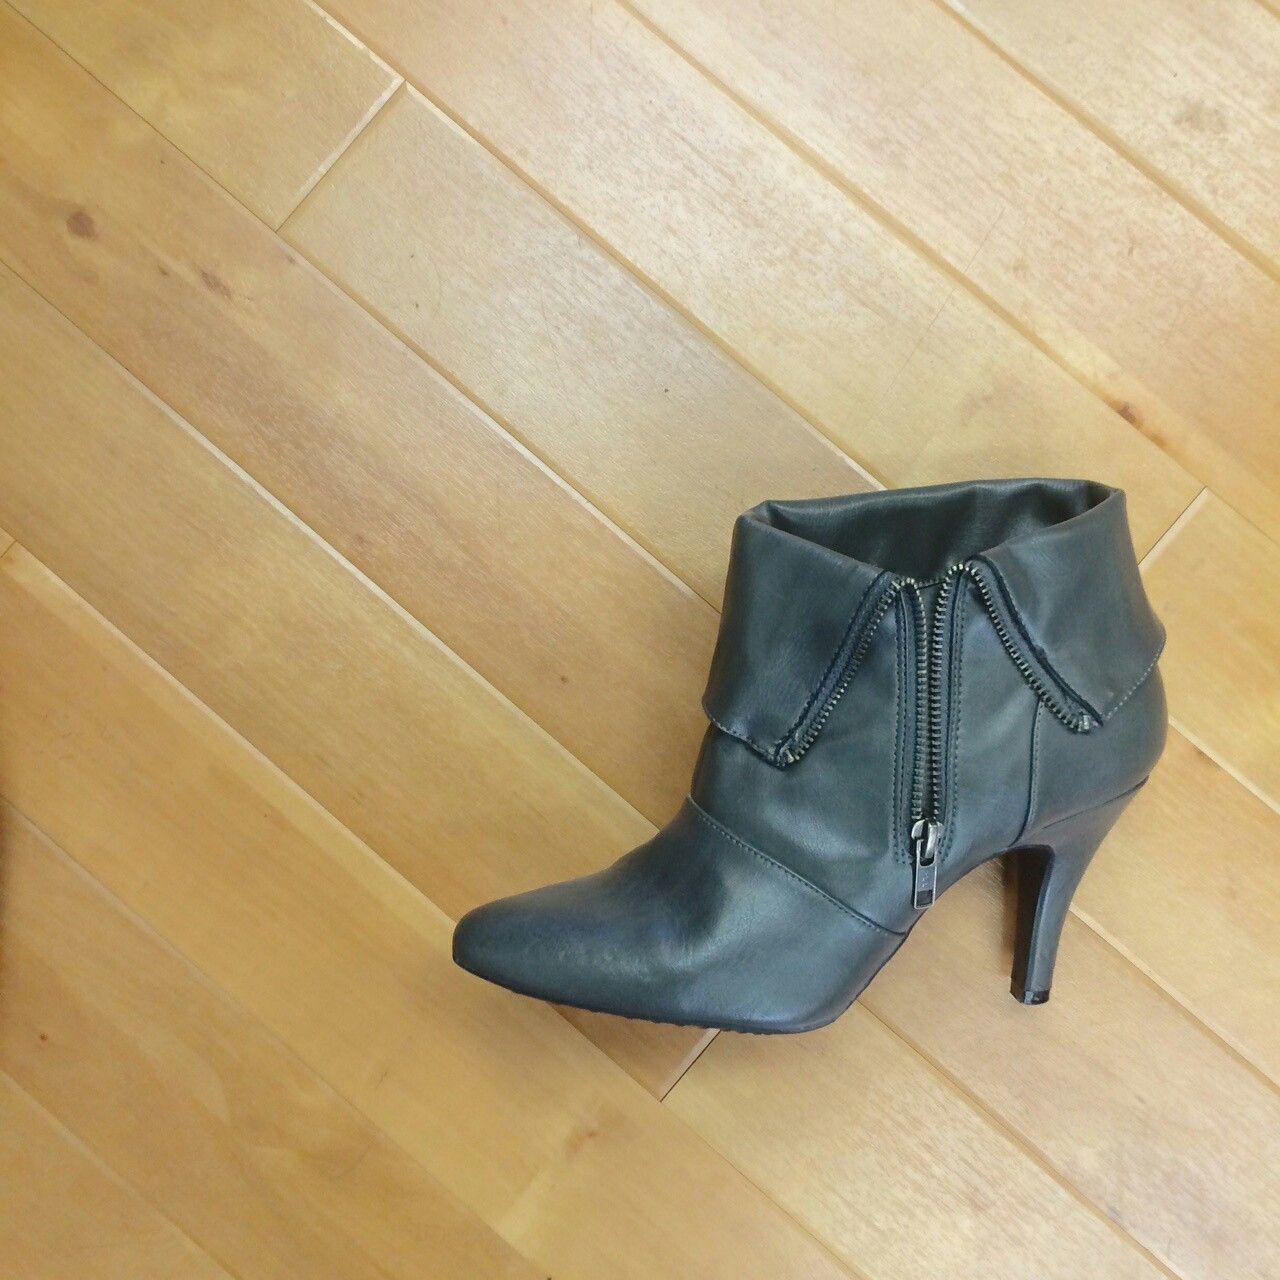 Diba Ankle Boots -- Size 8.5 -- $18!  - - - #michaelkors #mk #michael #kors #handbag #diba #ankleboots #ankle #boots #ajunto #whatsupweekend #cmparkmeadows #clothesmentor #hotitemsdaily #upscaleresale #resale #namebrands #whypaymore #shopclothesmentor #shop #with #us